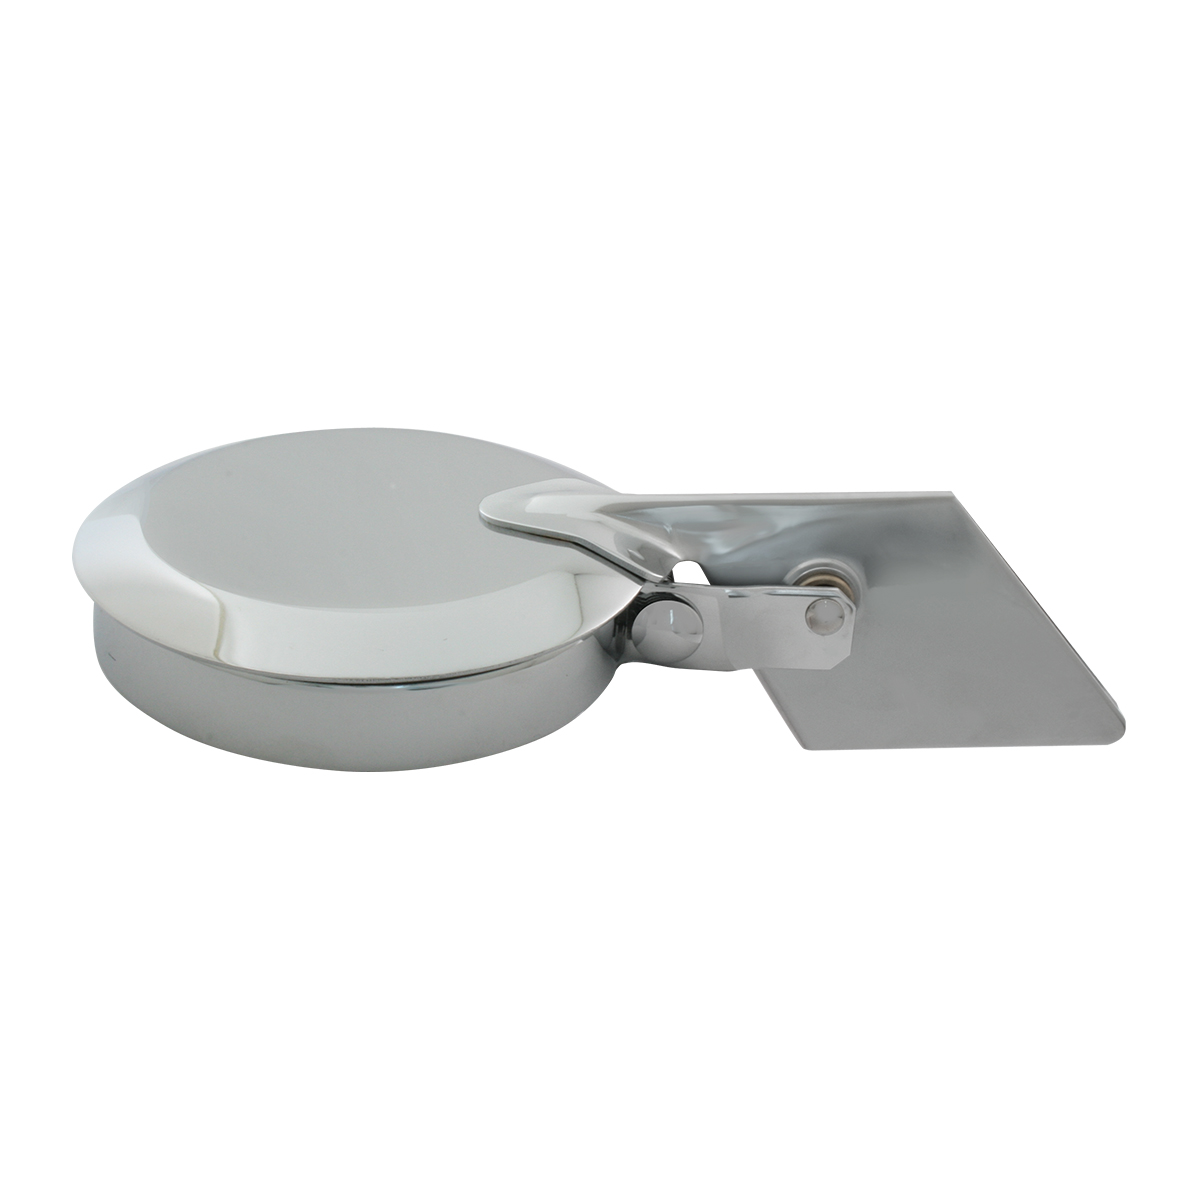 #95051 Chrome Plated Steel Rain Cap - Closed